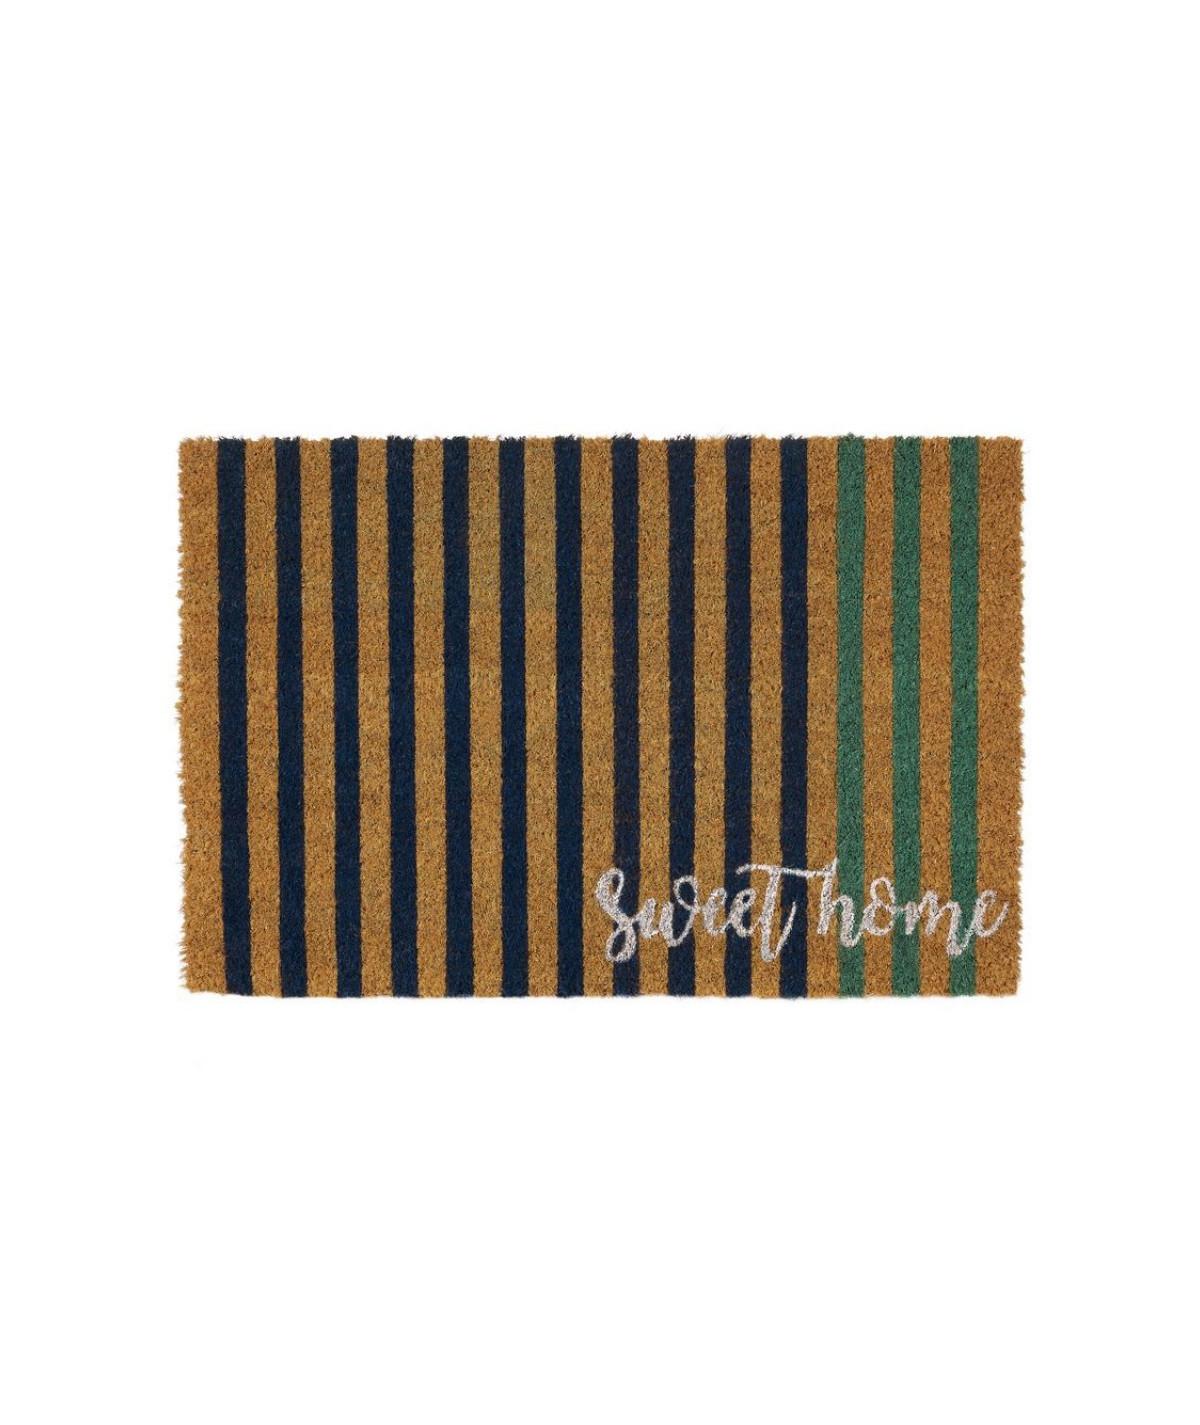 Paillasson coco à rayures bleu 60x40cm - Strip |YESDEKO